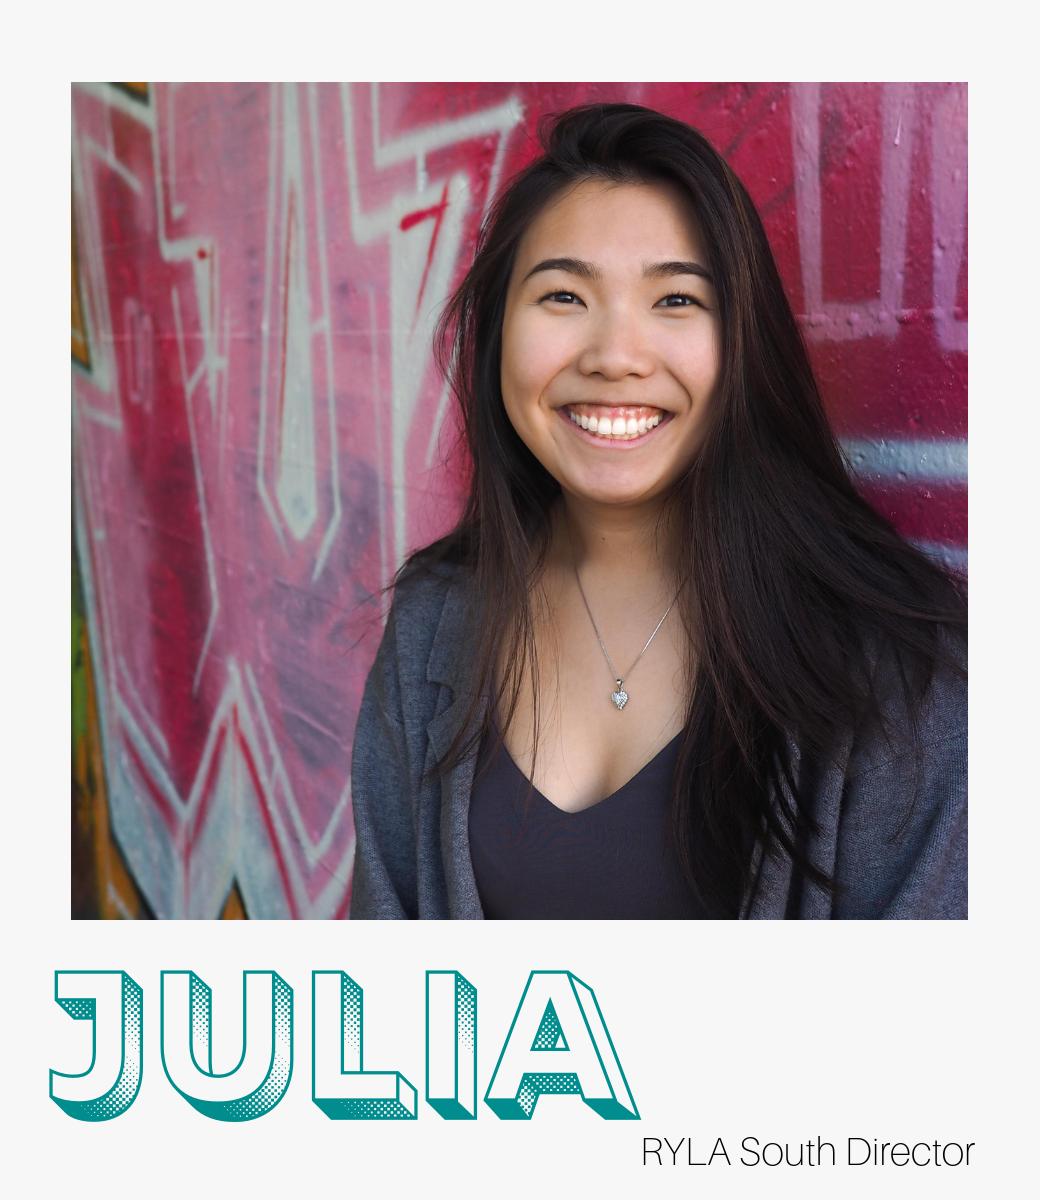 Julia - RYLA South Director